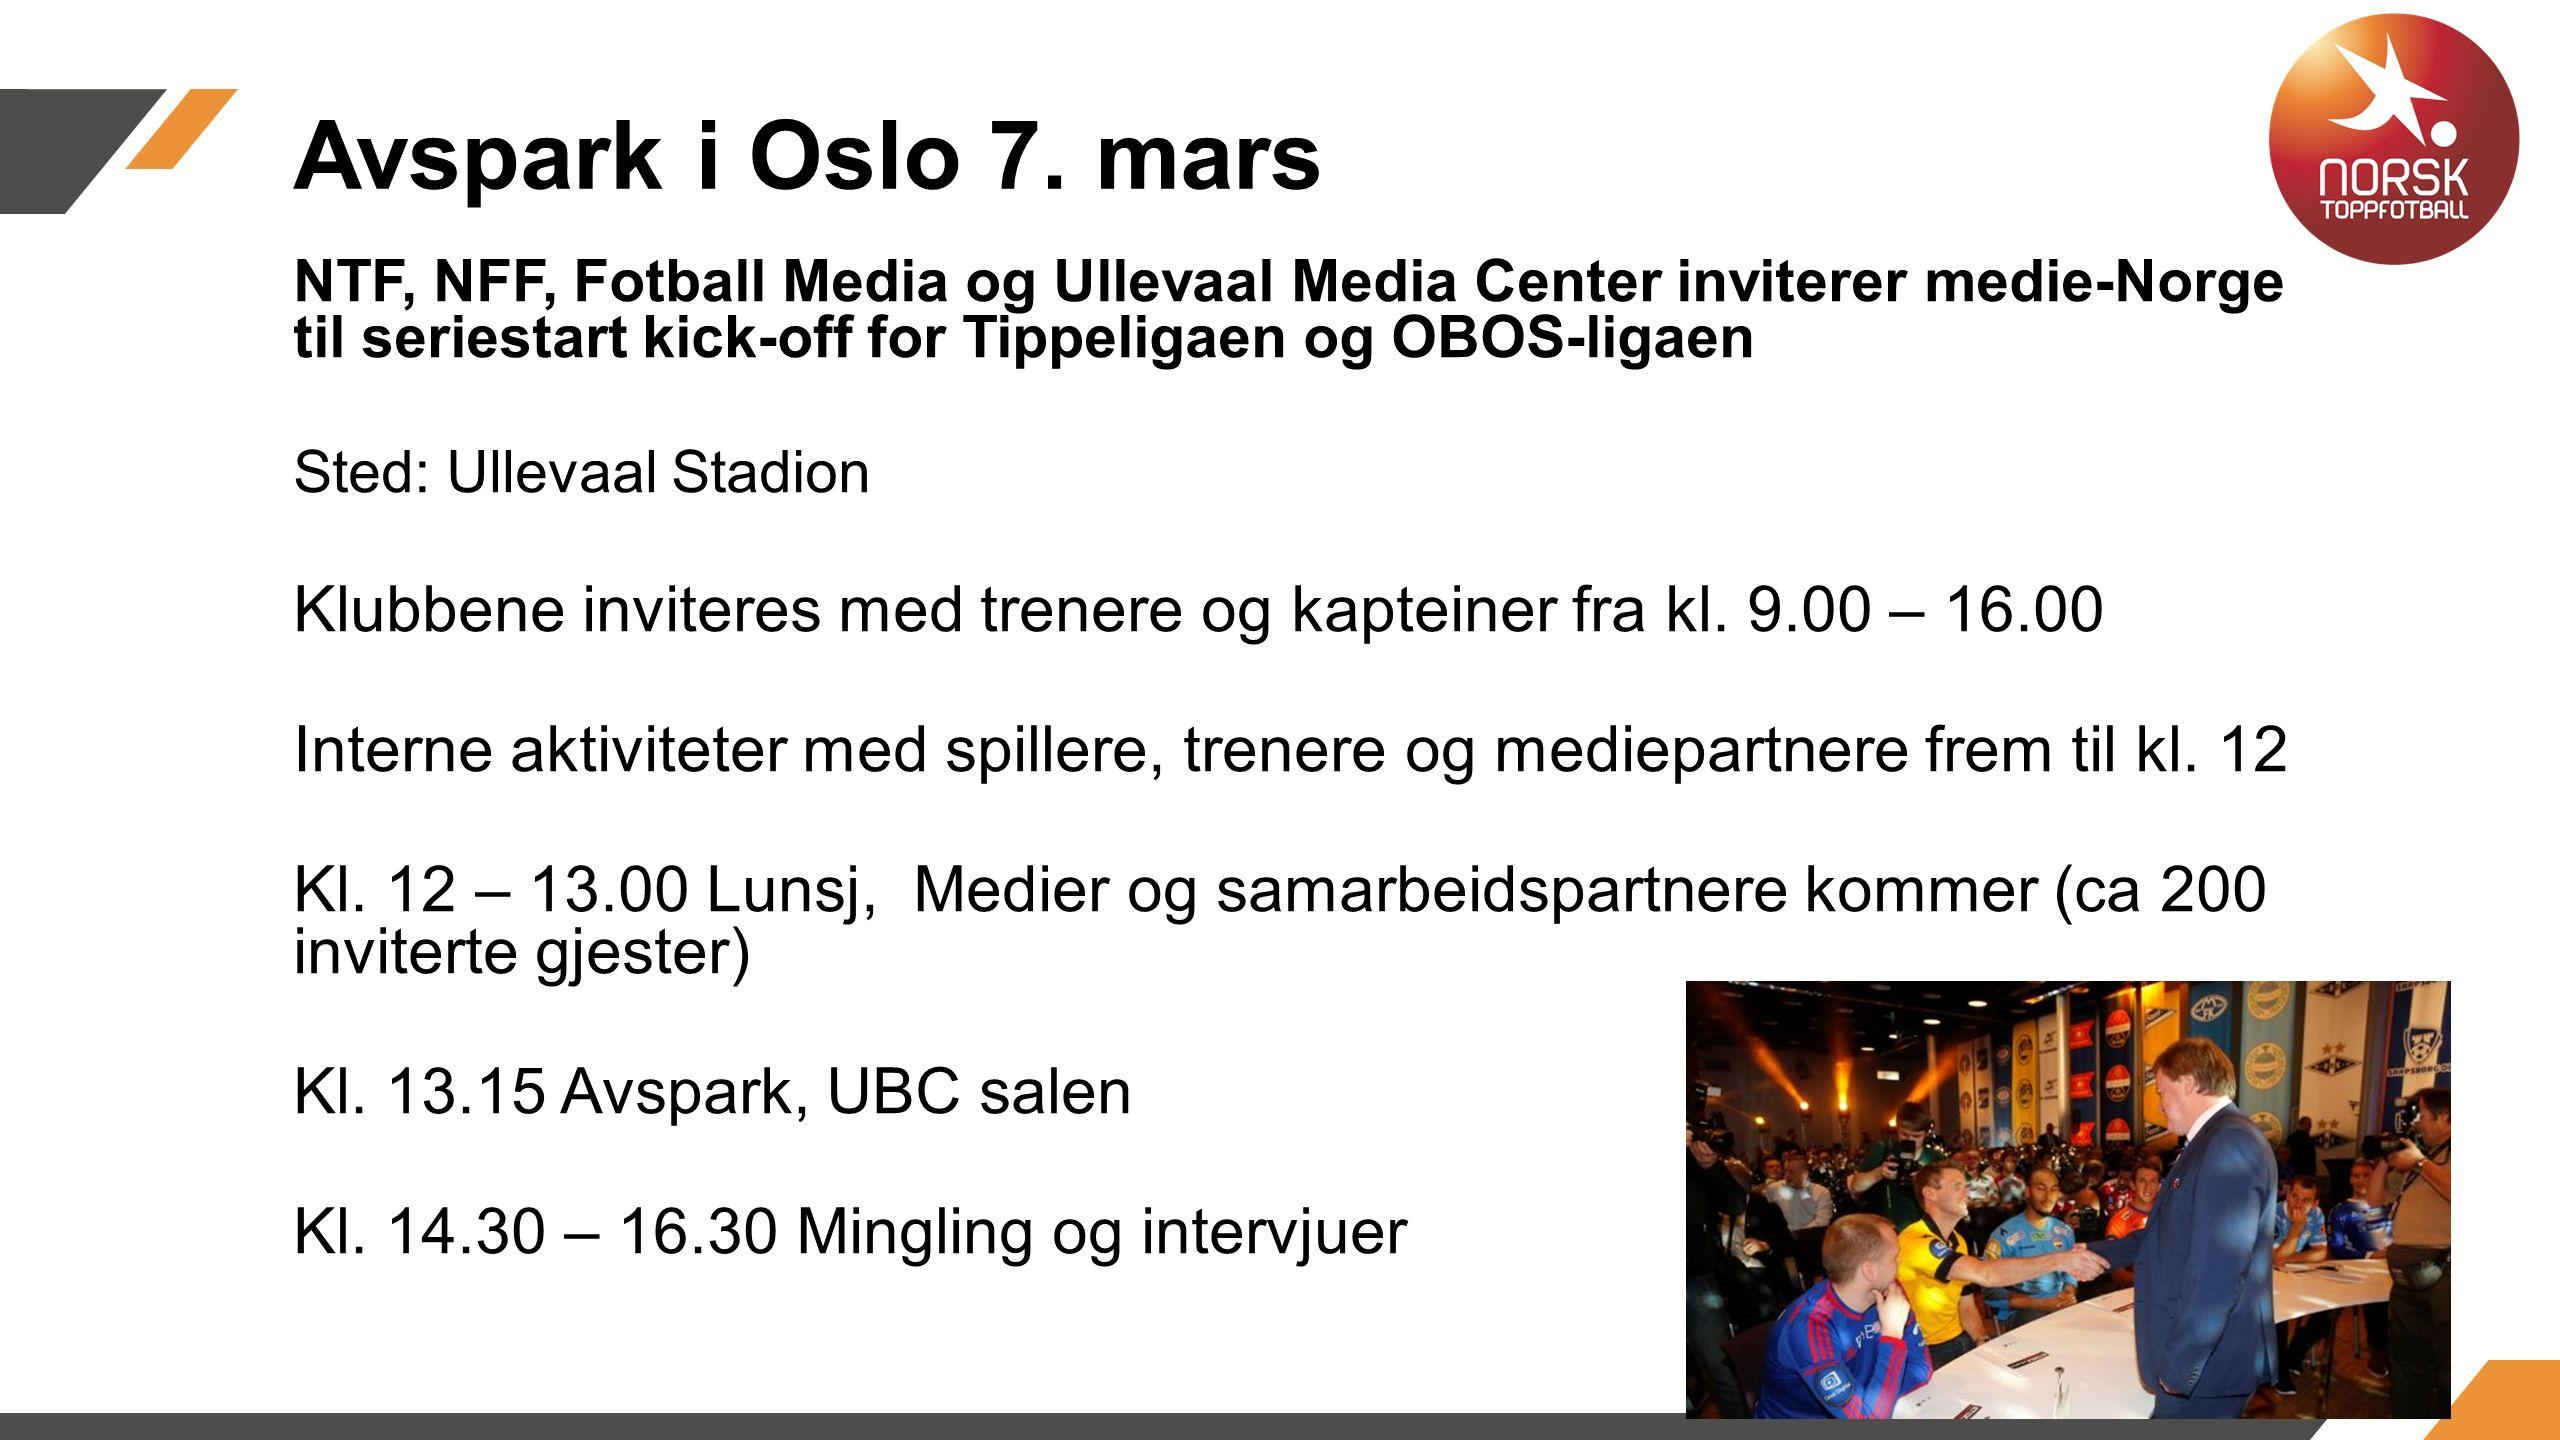 NTF, NFF, Fotball Media og Ullevaal Media Center inviterer medie-Norge til seriestart kick-off for Tippeligaen og OBOS-ligaen Sted: Ullevaal Stadion Klubbene inviteres med trenere og kapteiner fra kl.